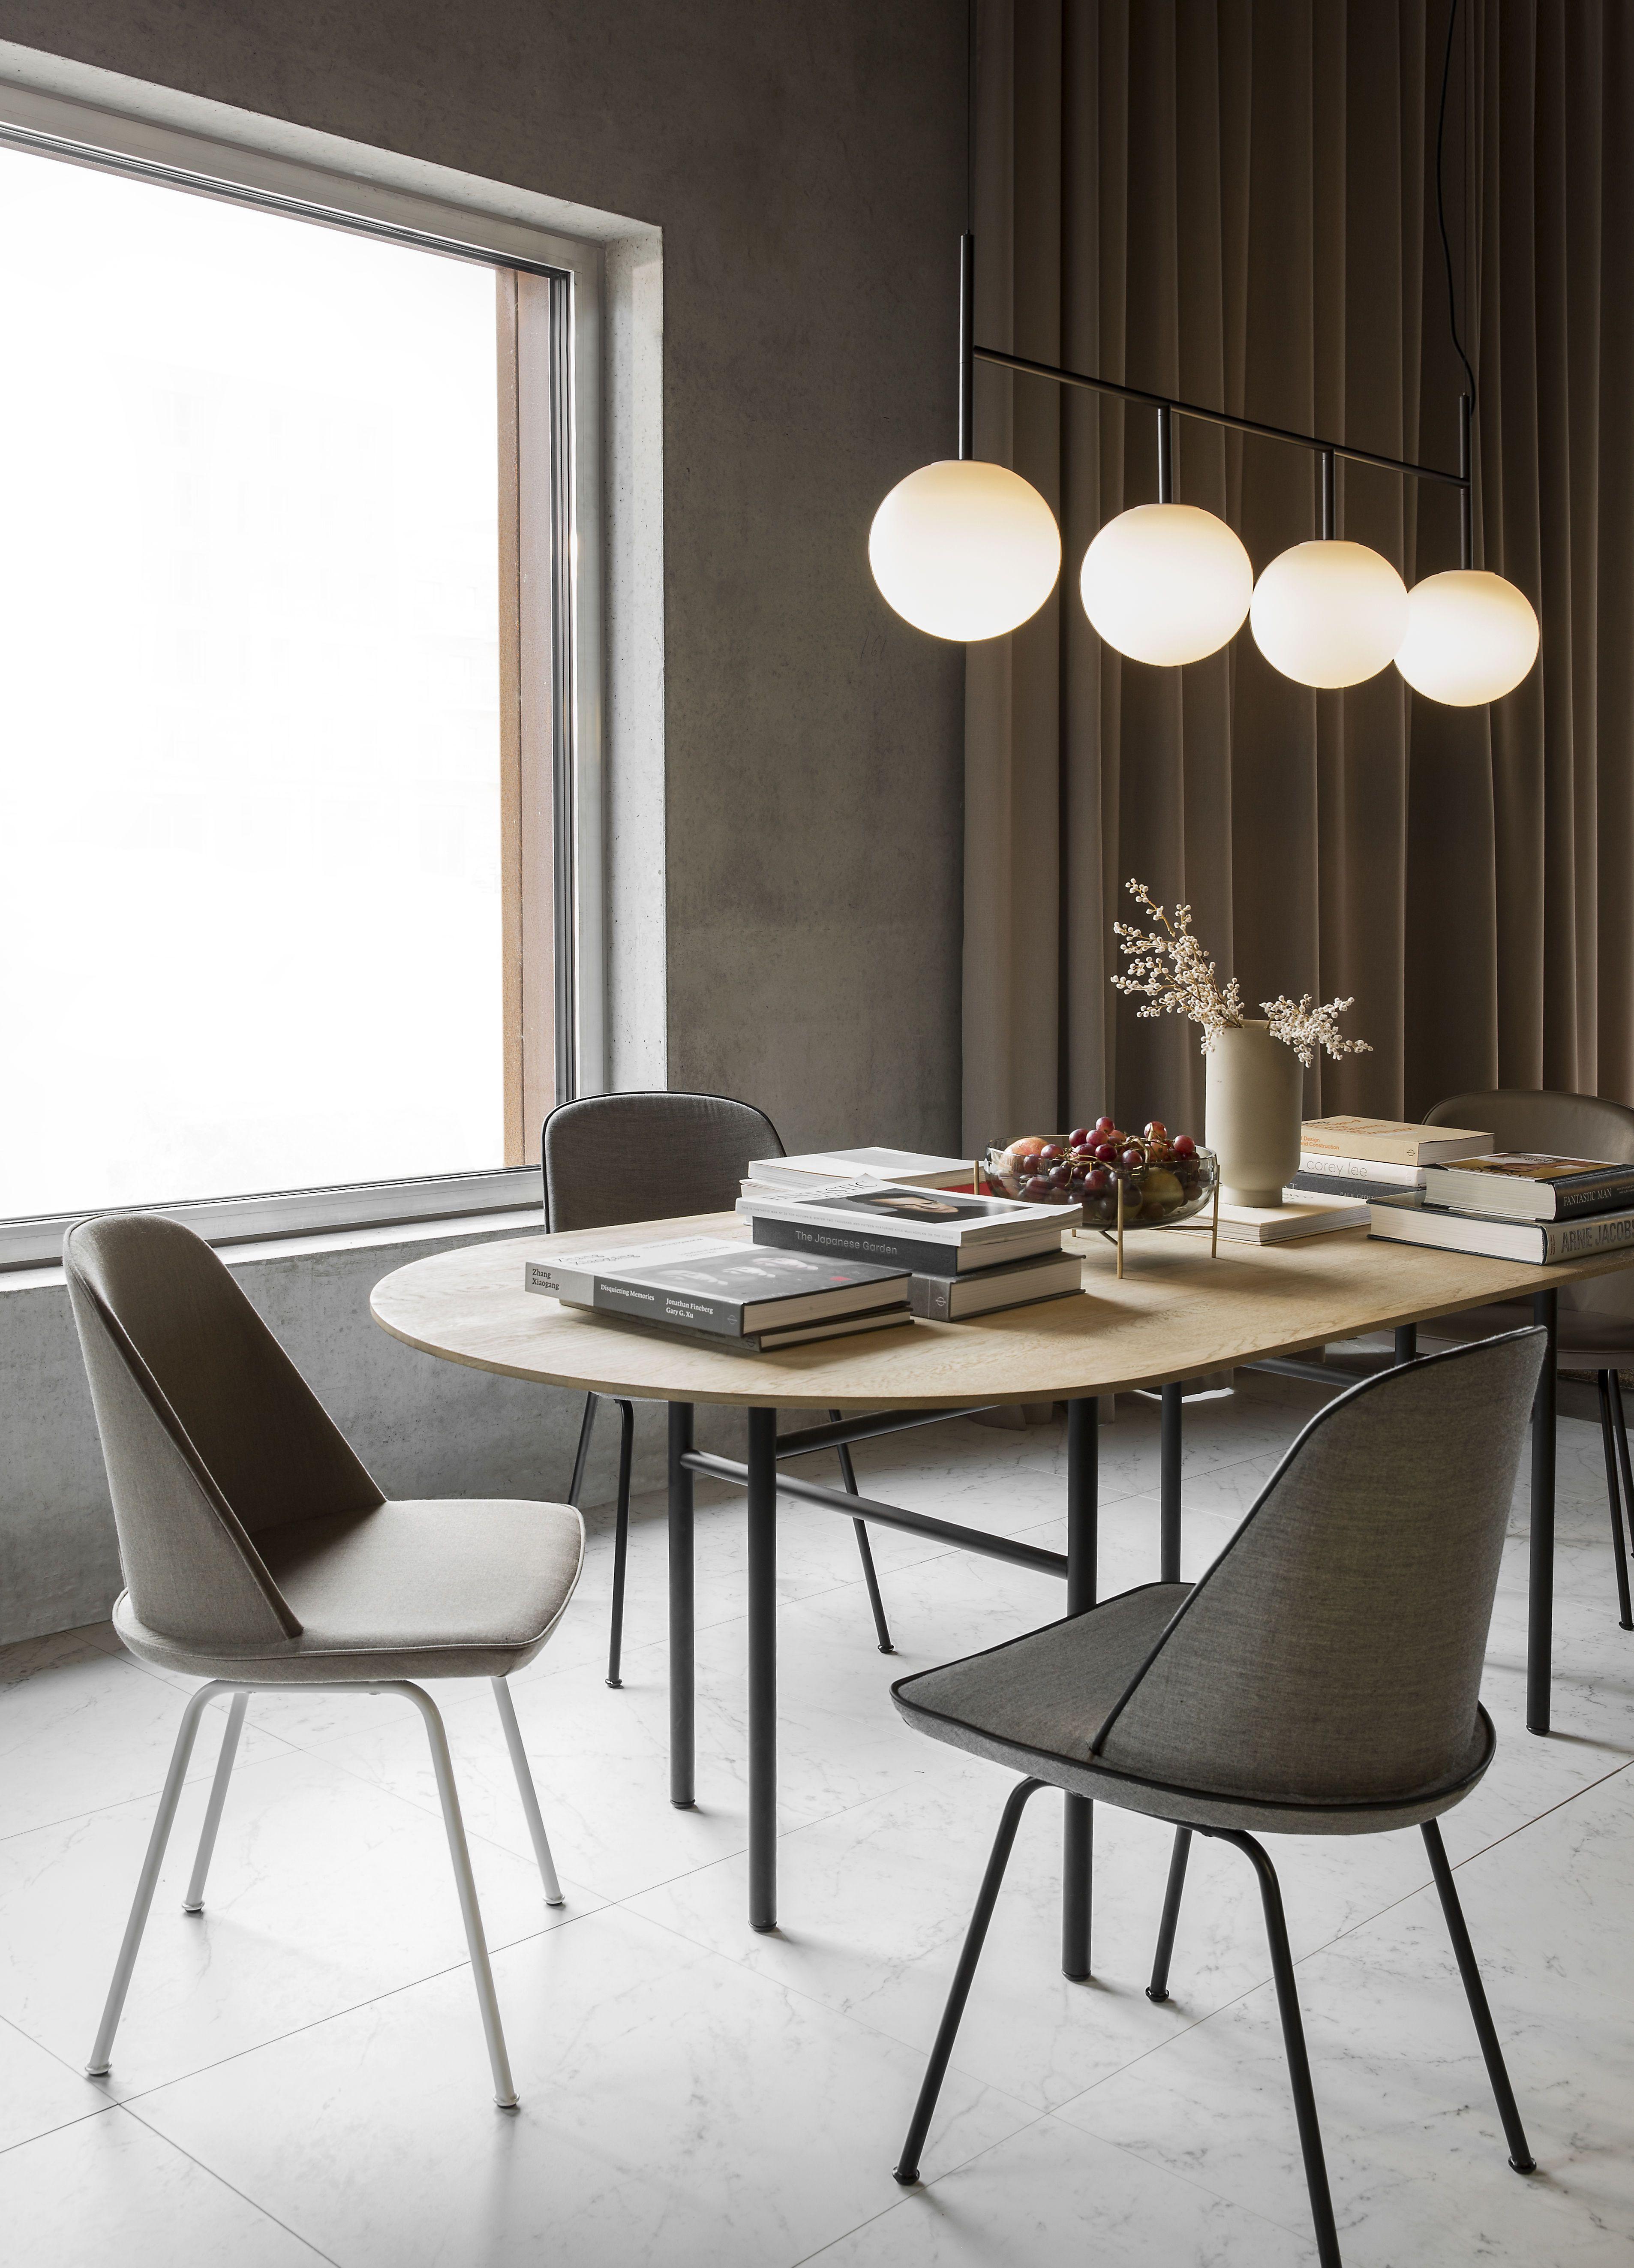 Menu ss18 synnes chair snaregade tr bulb suspension frame 餐厅